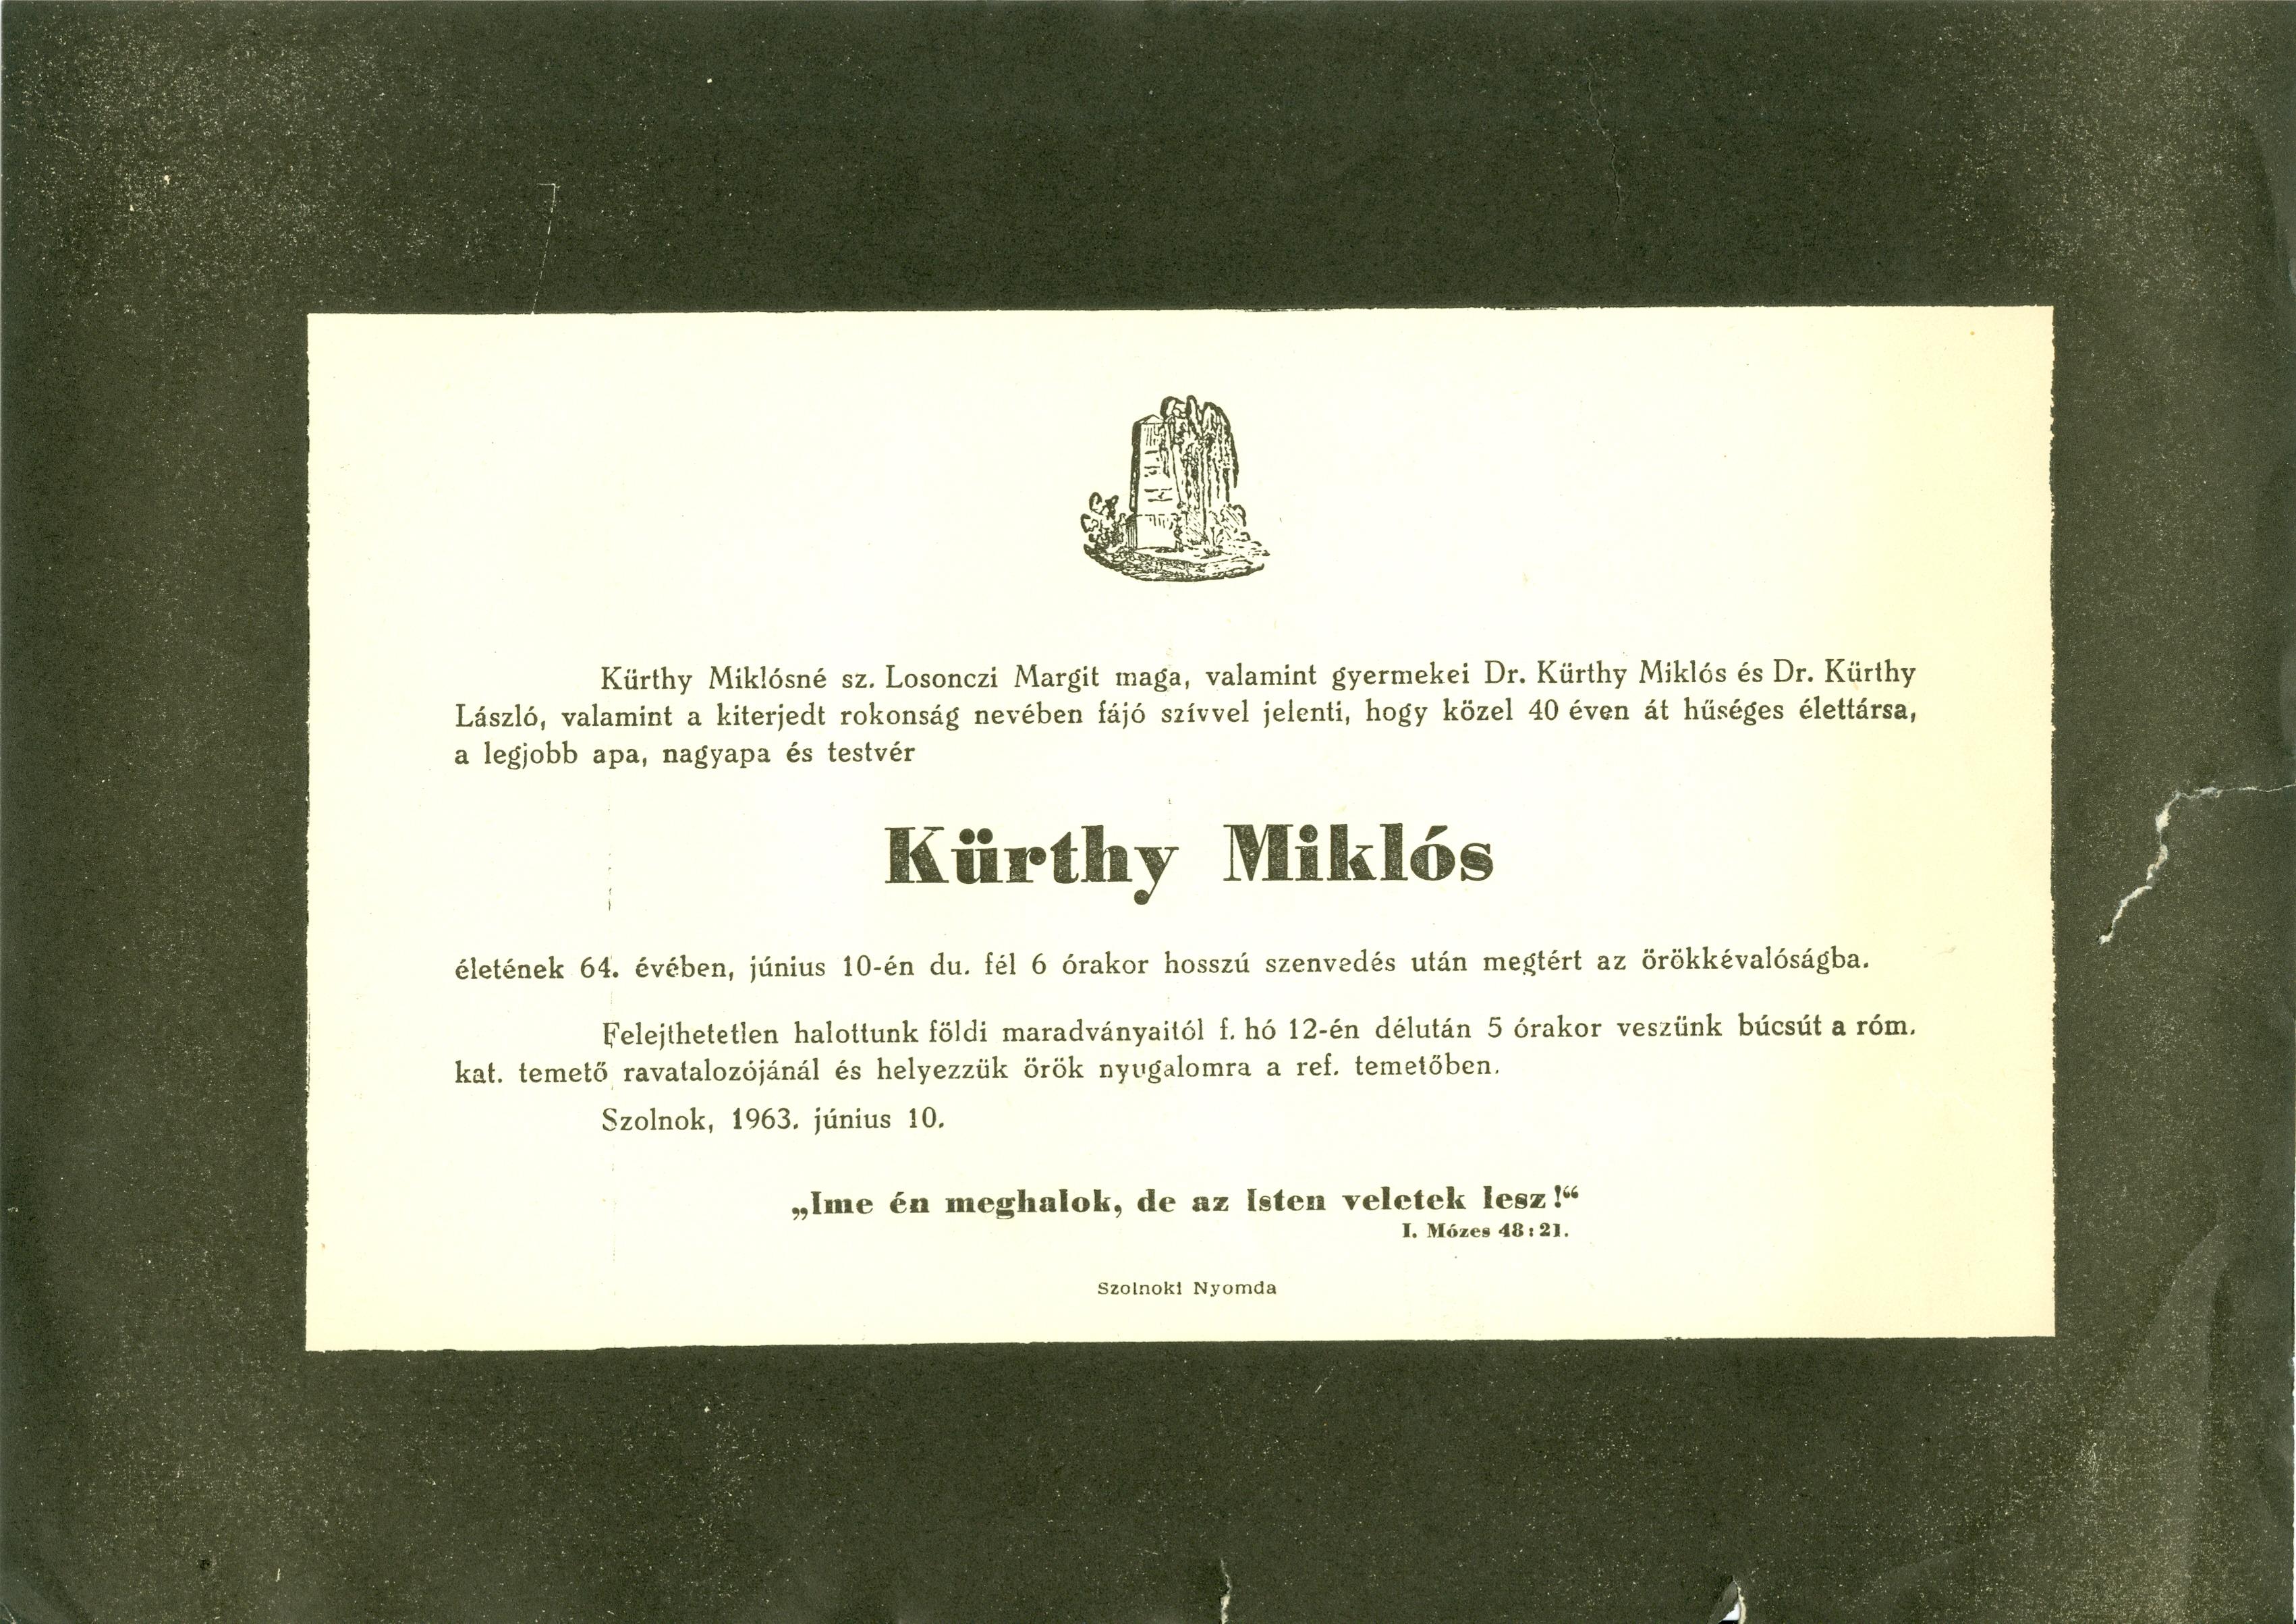 Kürthy Miklós